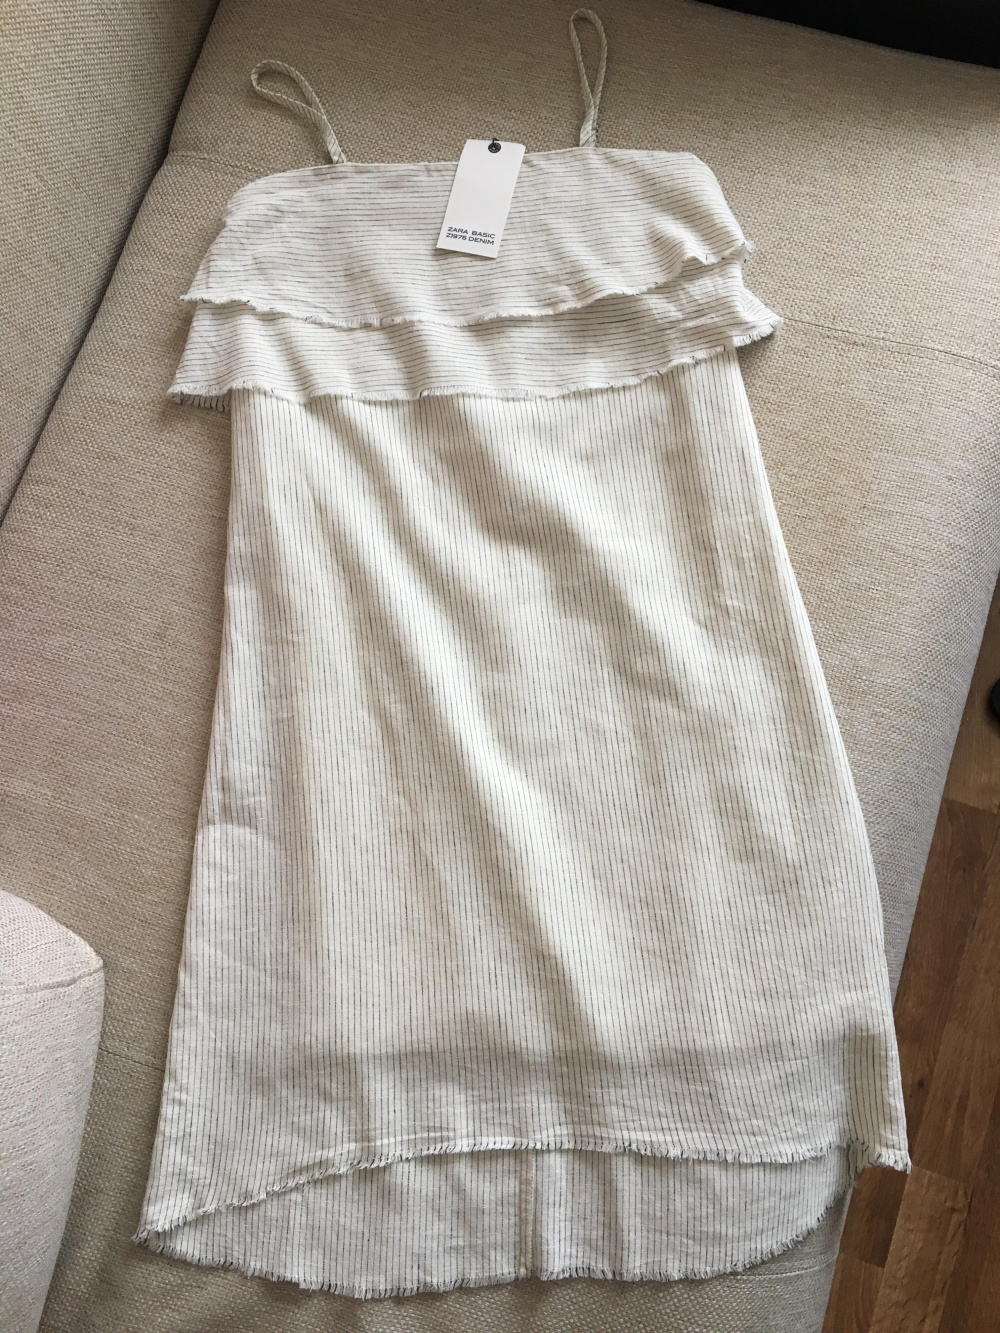 Платье Zara, размер хс большемерка